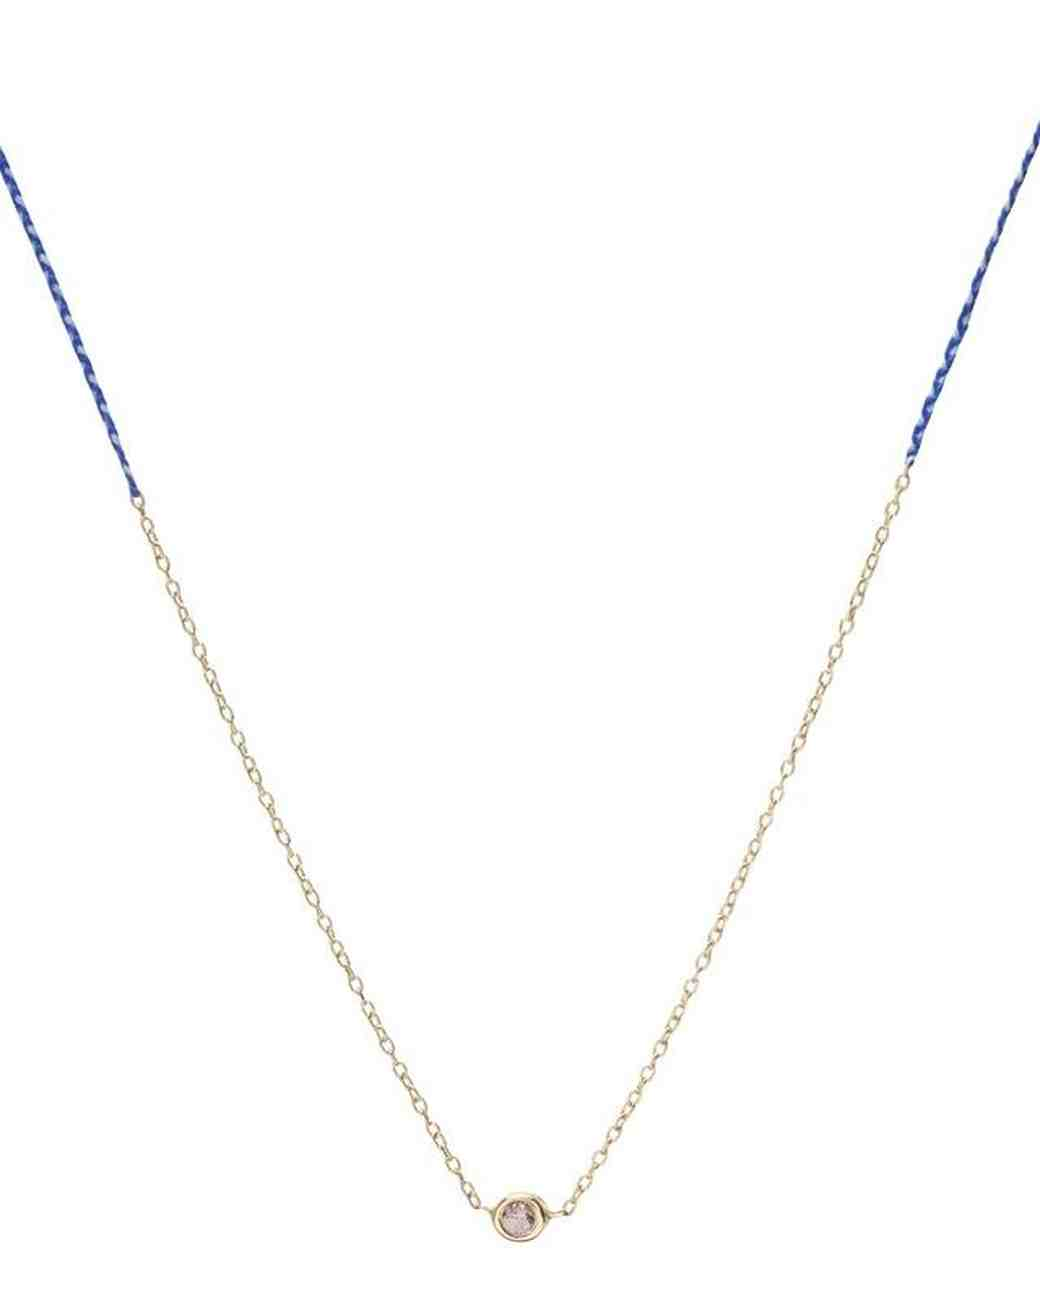 delicate gold necklace pendant Scosha